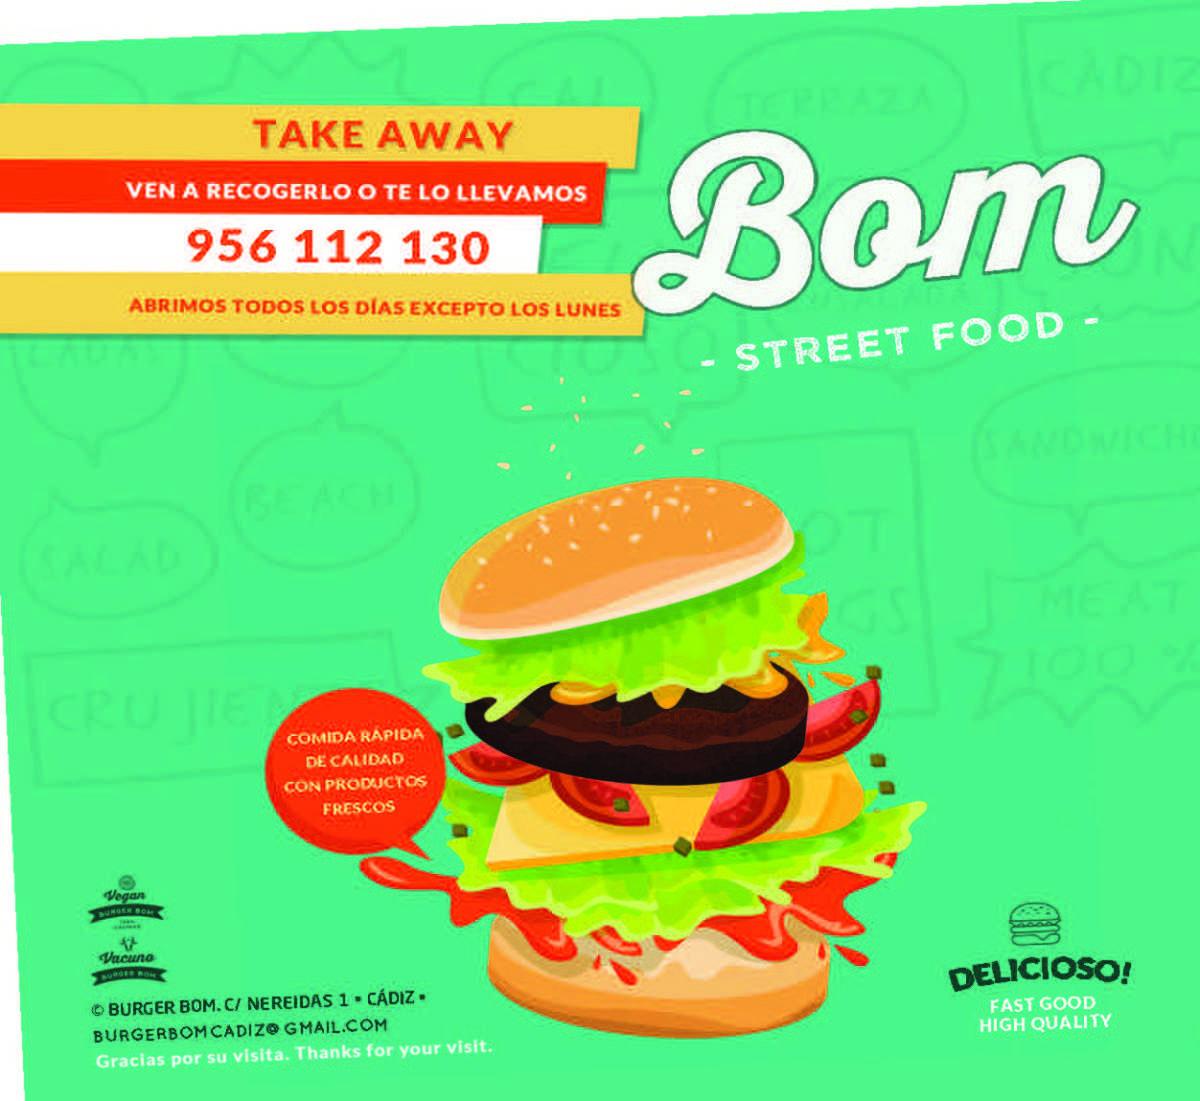 Burger Bom